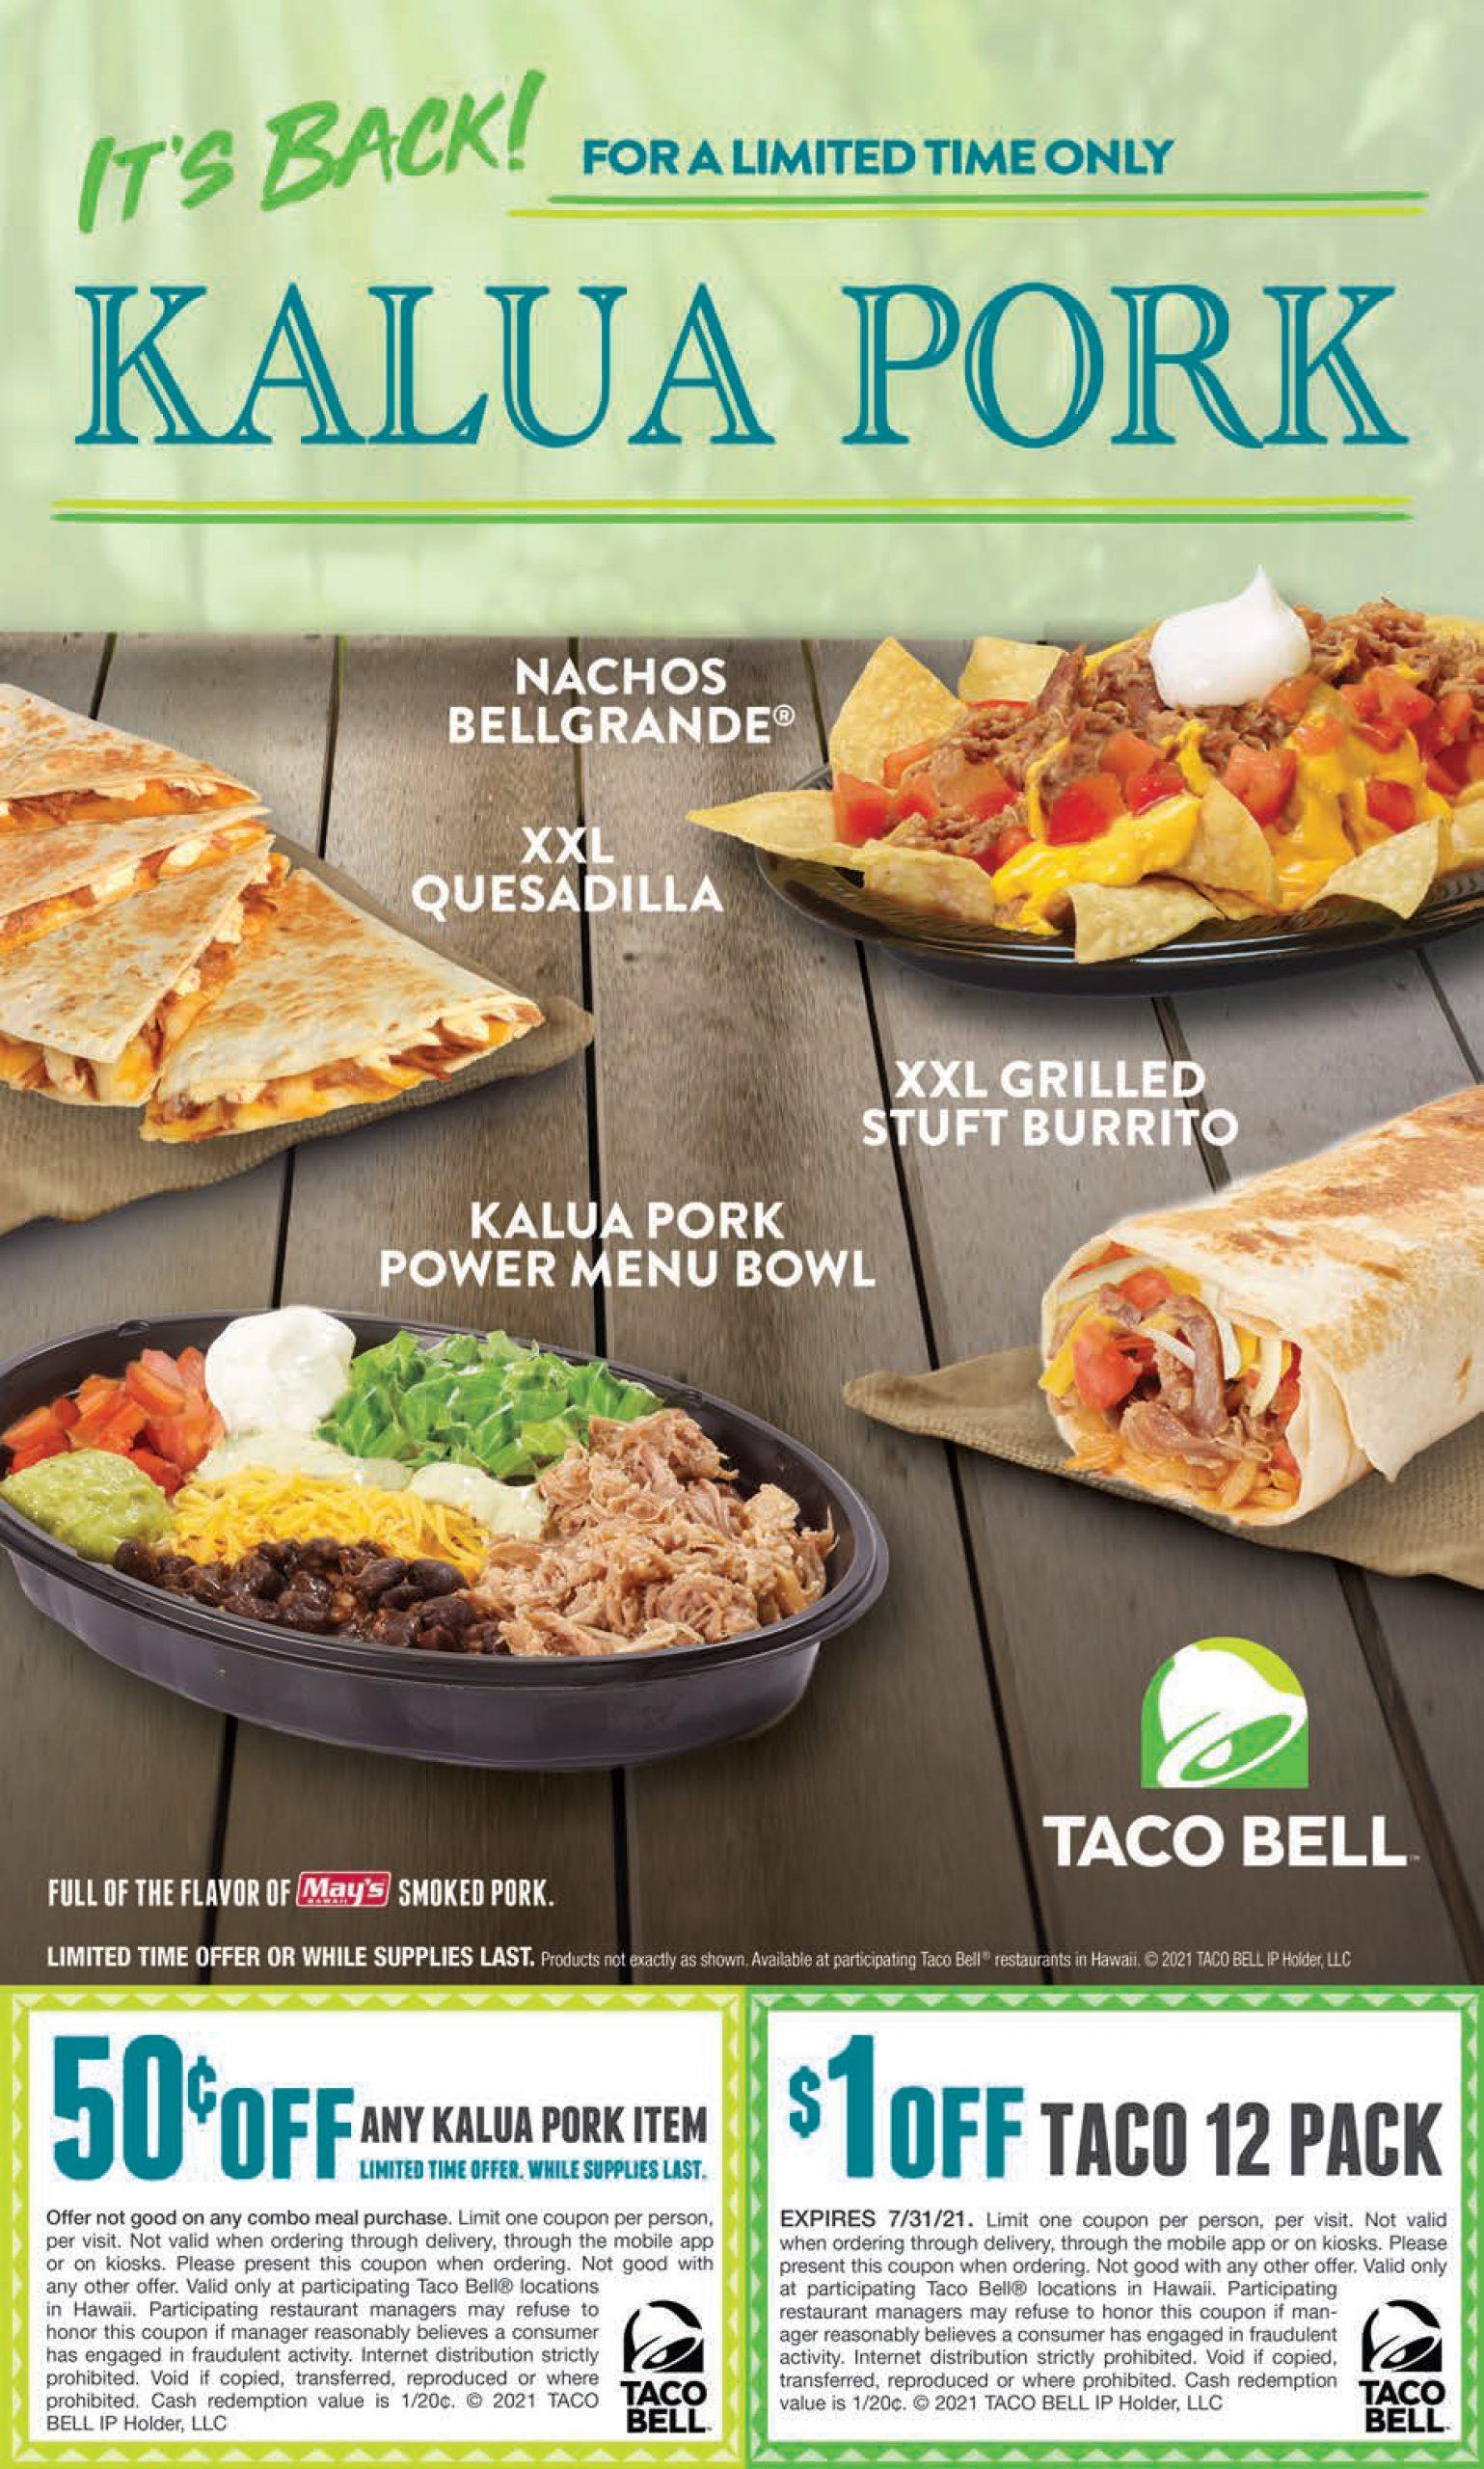 Taco Bell Kalua Pork